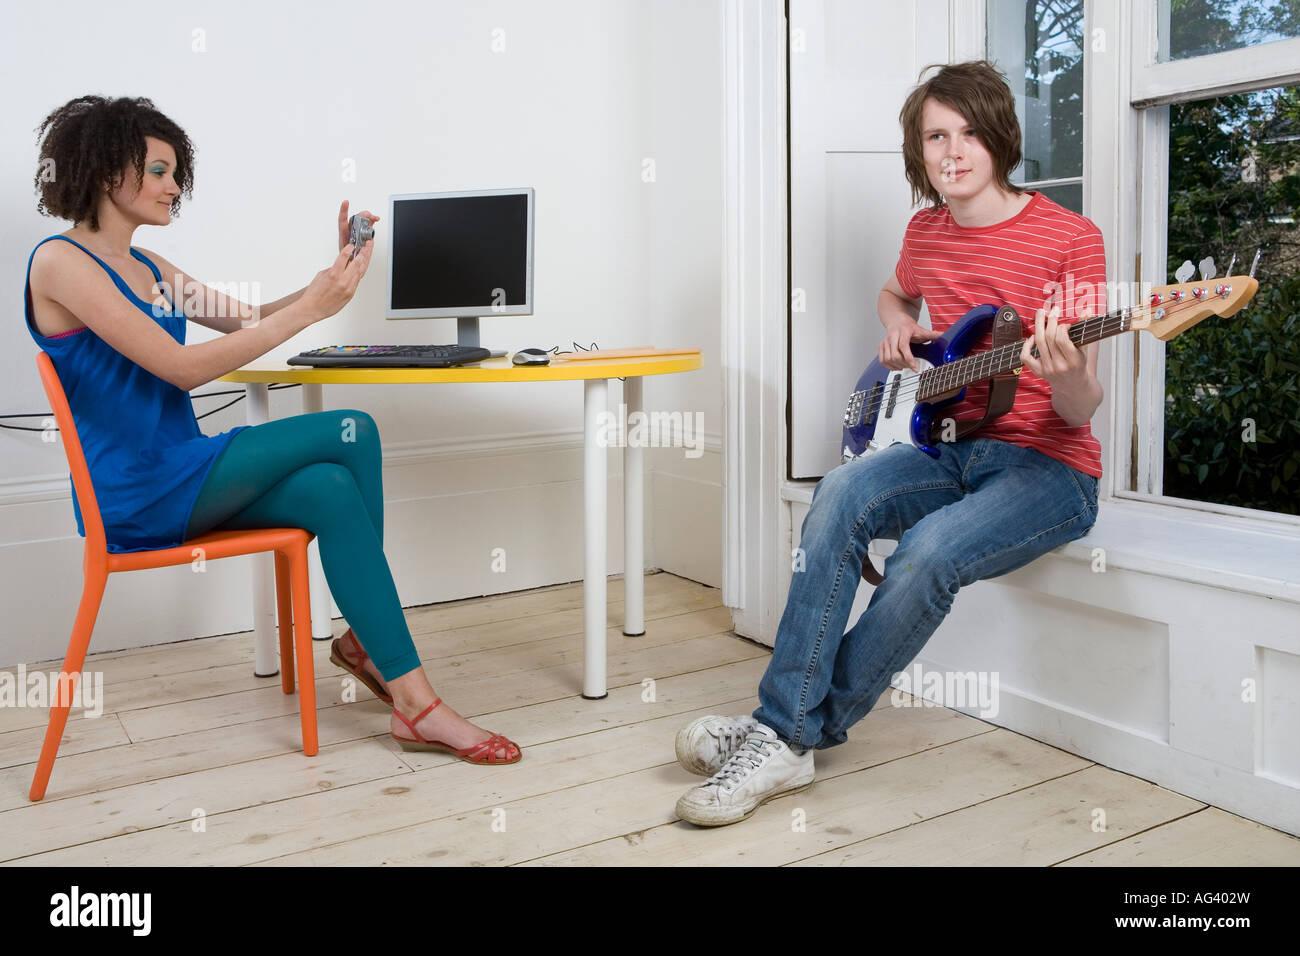 Girl photographing boy playing guitar - Stock Image